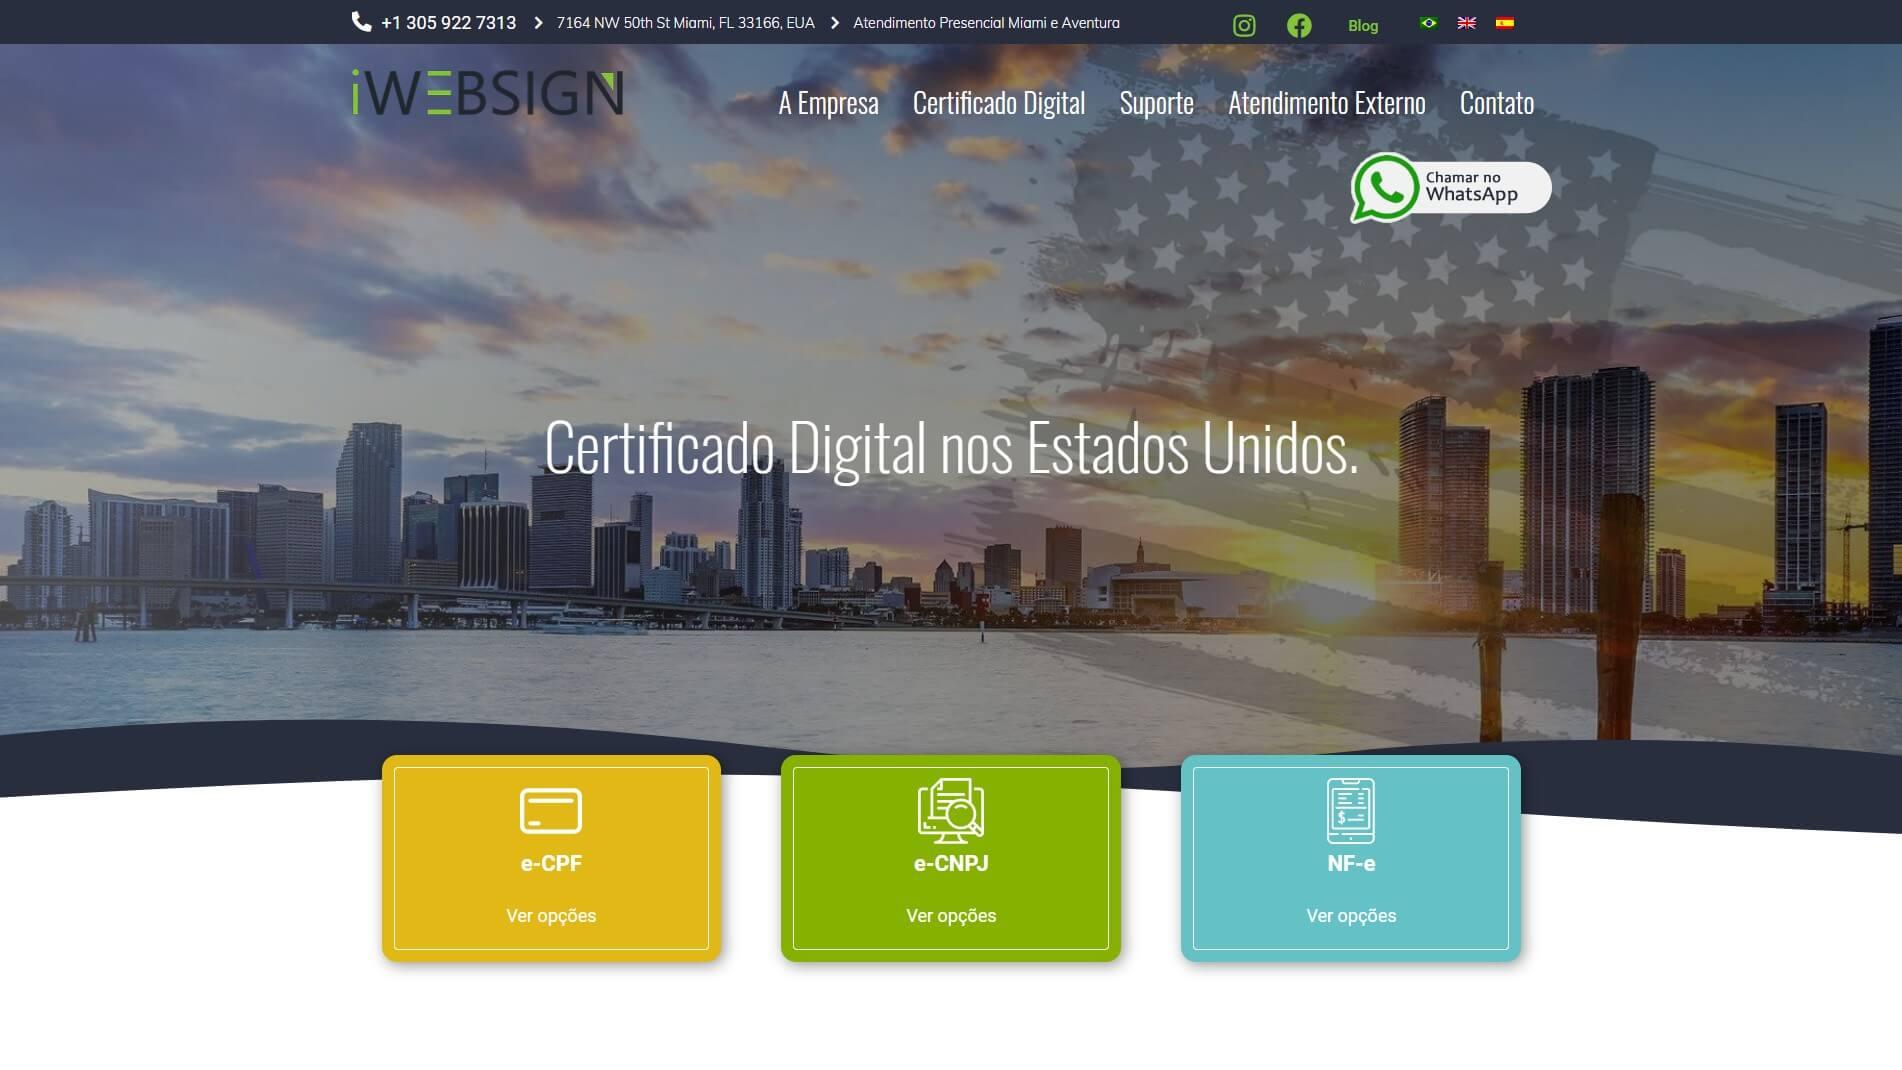 lajet-digital-iwebsign_cr